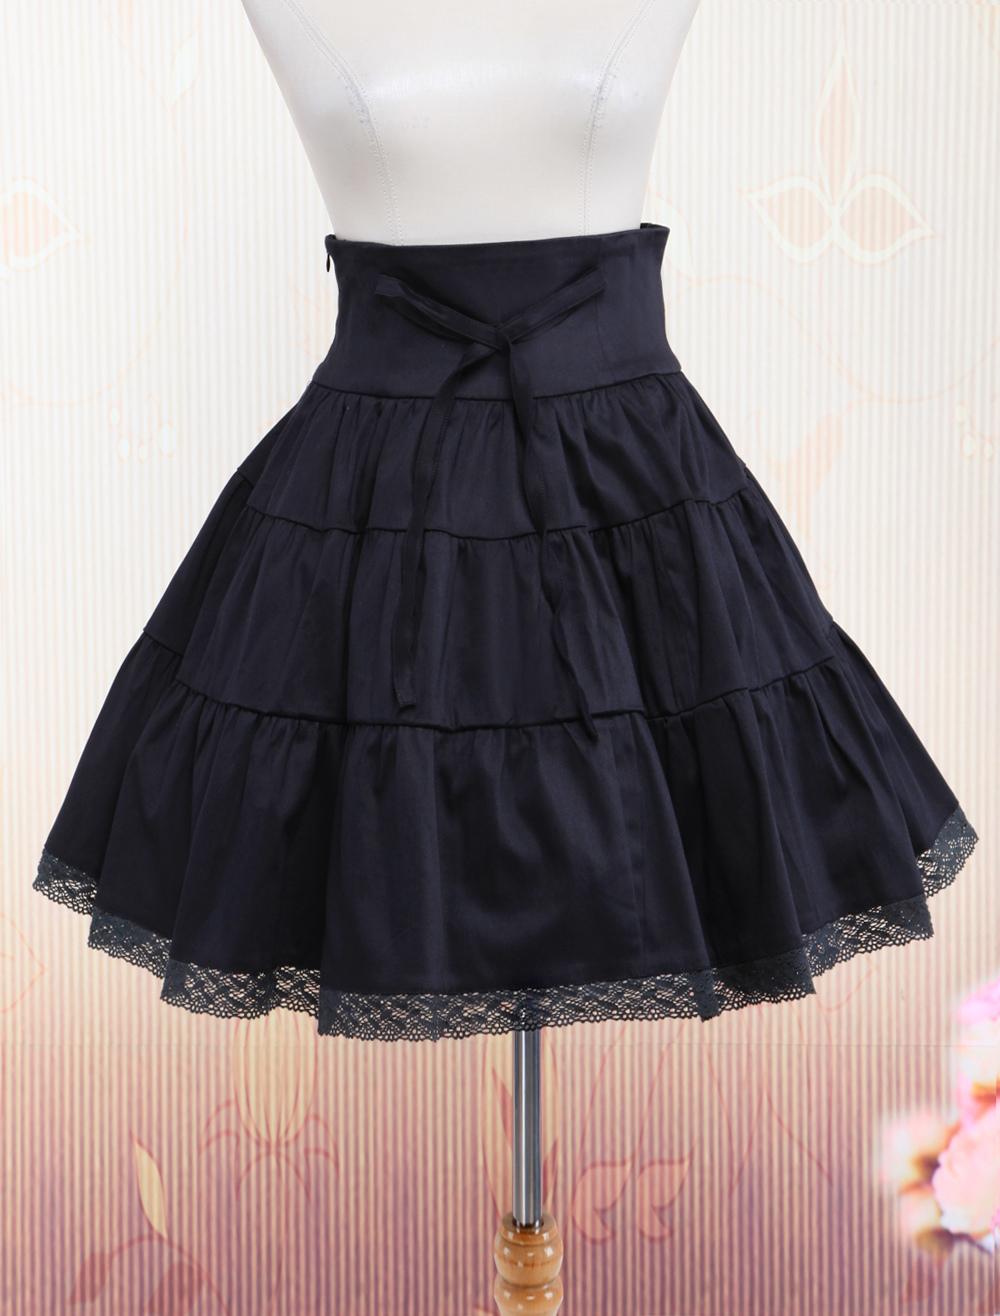 Black Cotton Crocheted Lace Lolita Skirt